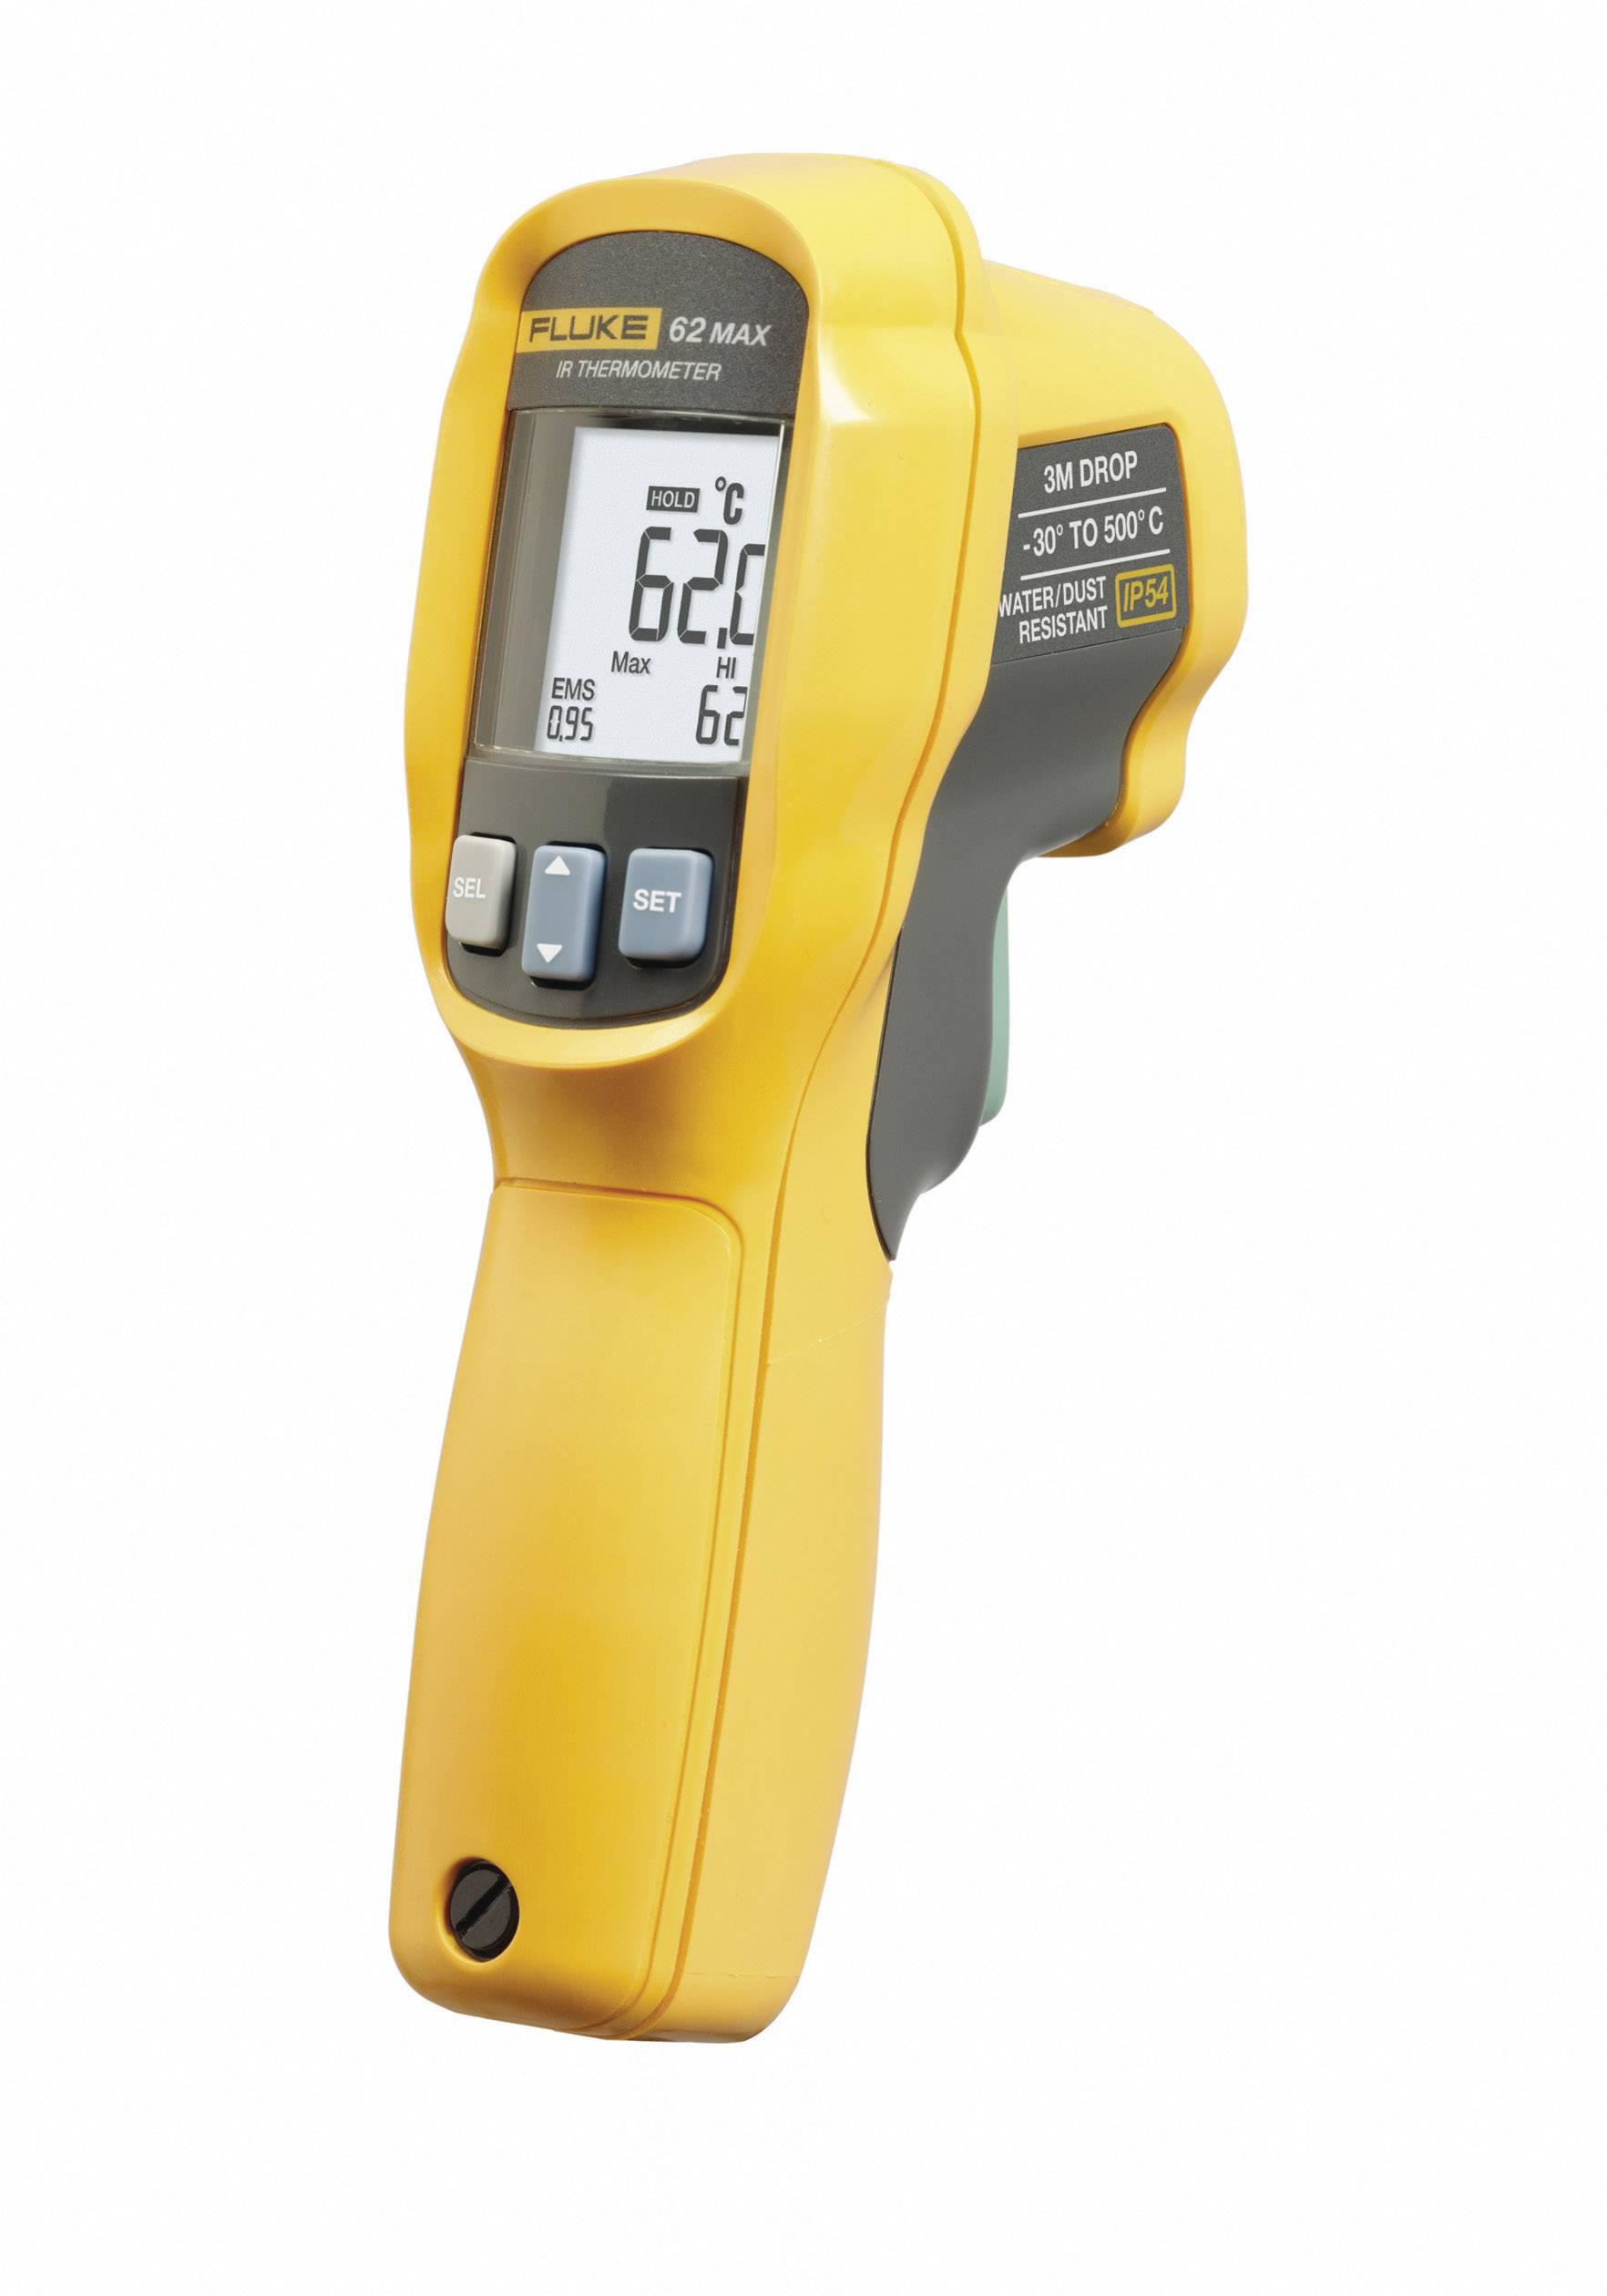 Fluke 62 MAX IR-termometer Optik 10 1  16cd7a4fca09d